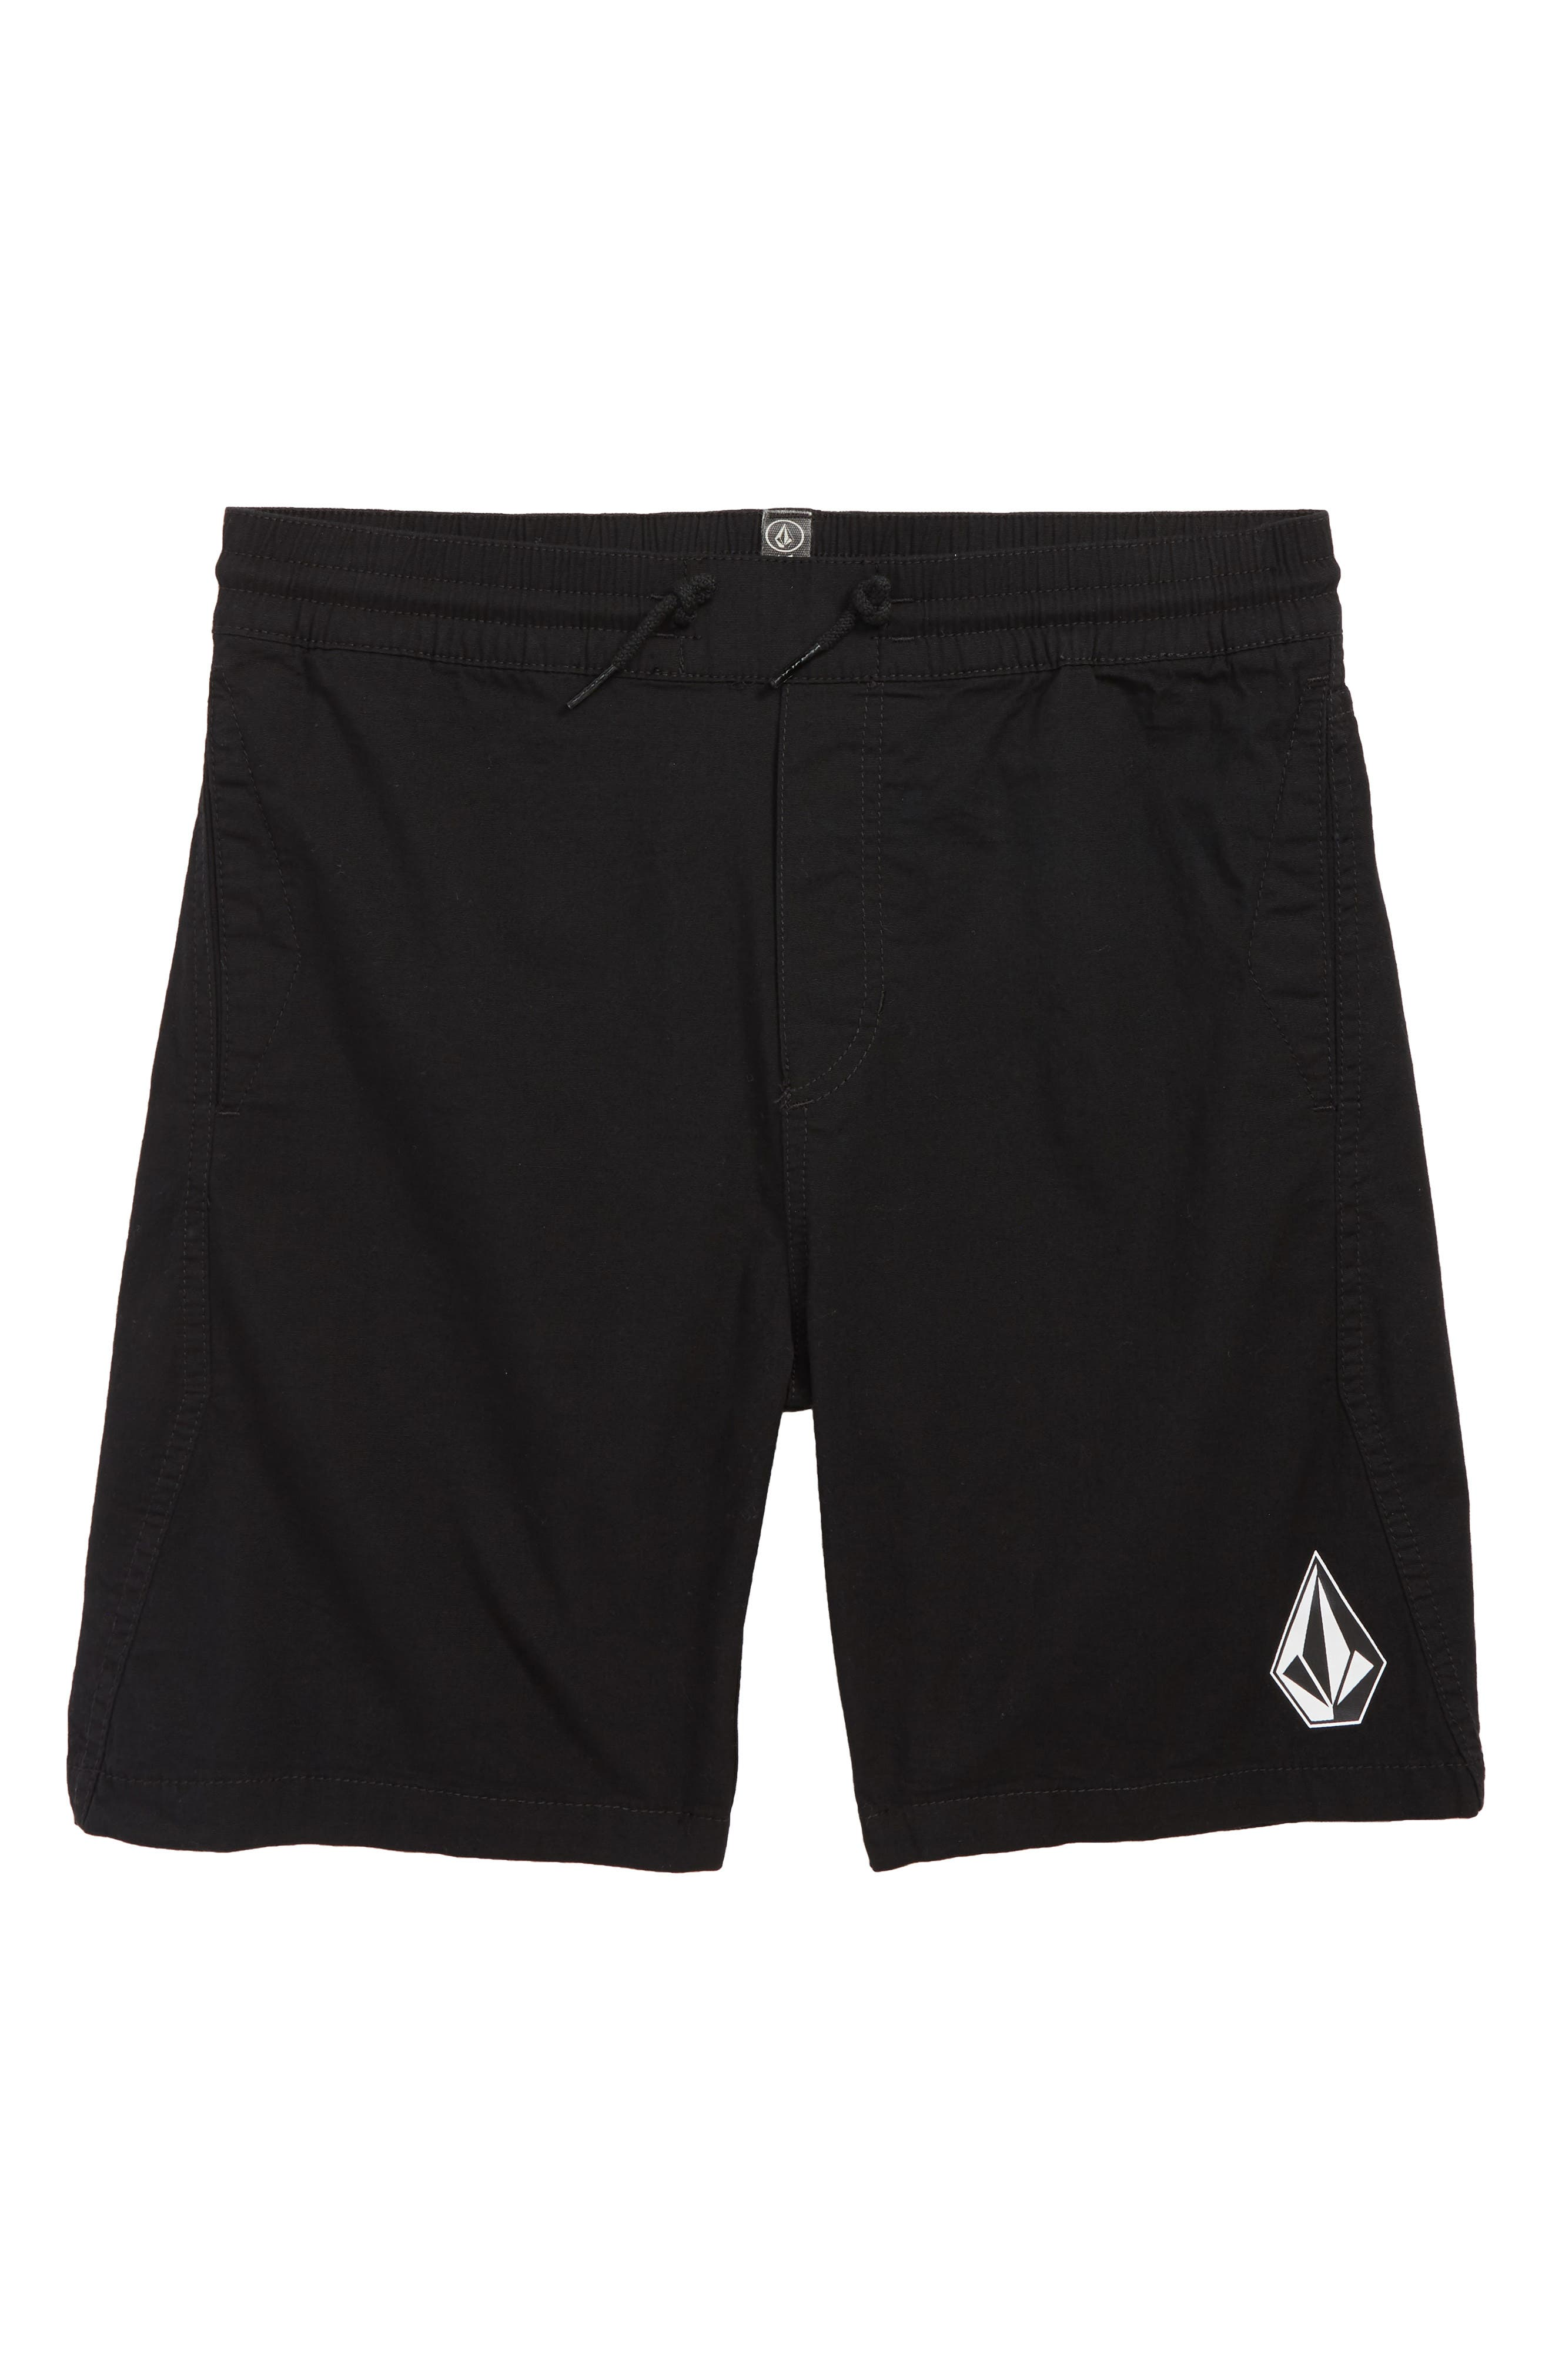 Boys Volcom Deadly Stones Shorts